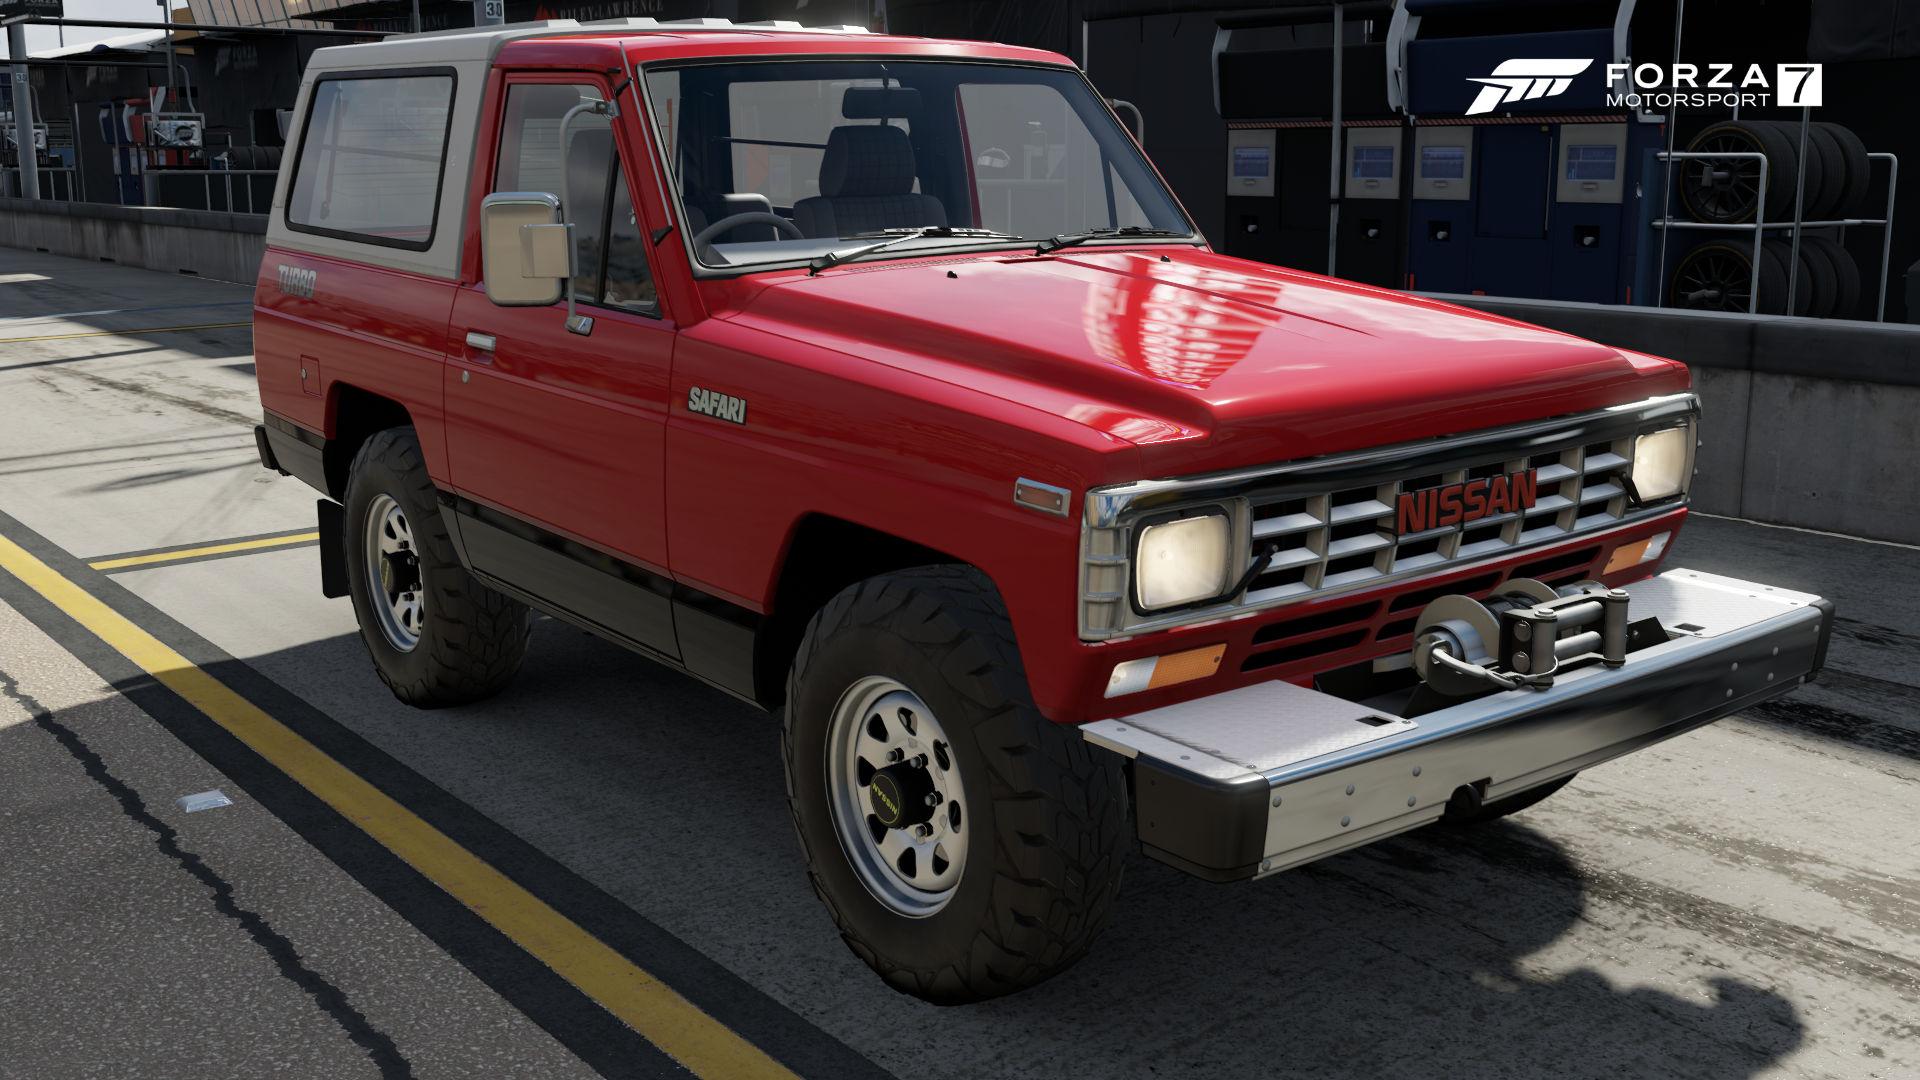 Nissan Safari Turbo | Forza Motorsport Wiki | FANDOM ...